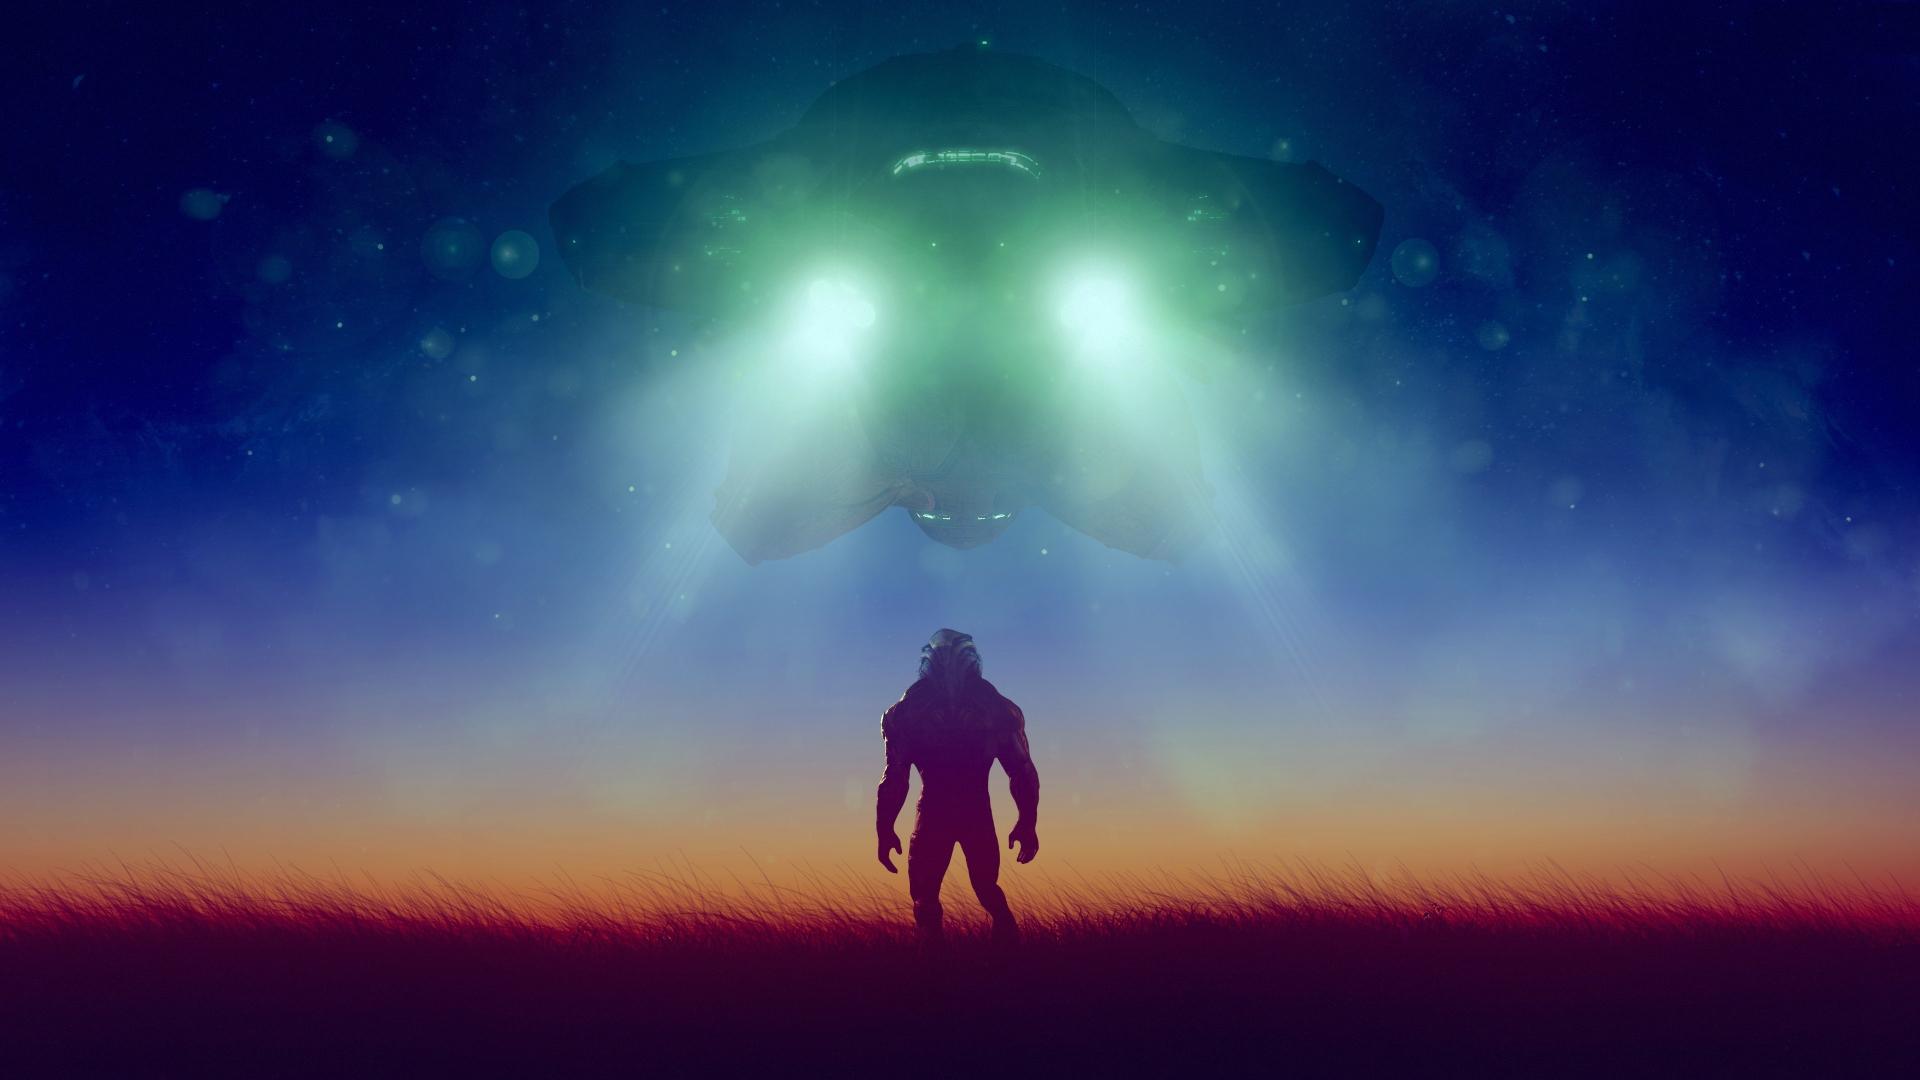 Download 1920x1080 Wallpaper Mass Effect Andromeda Extermination